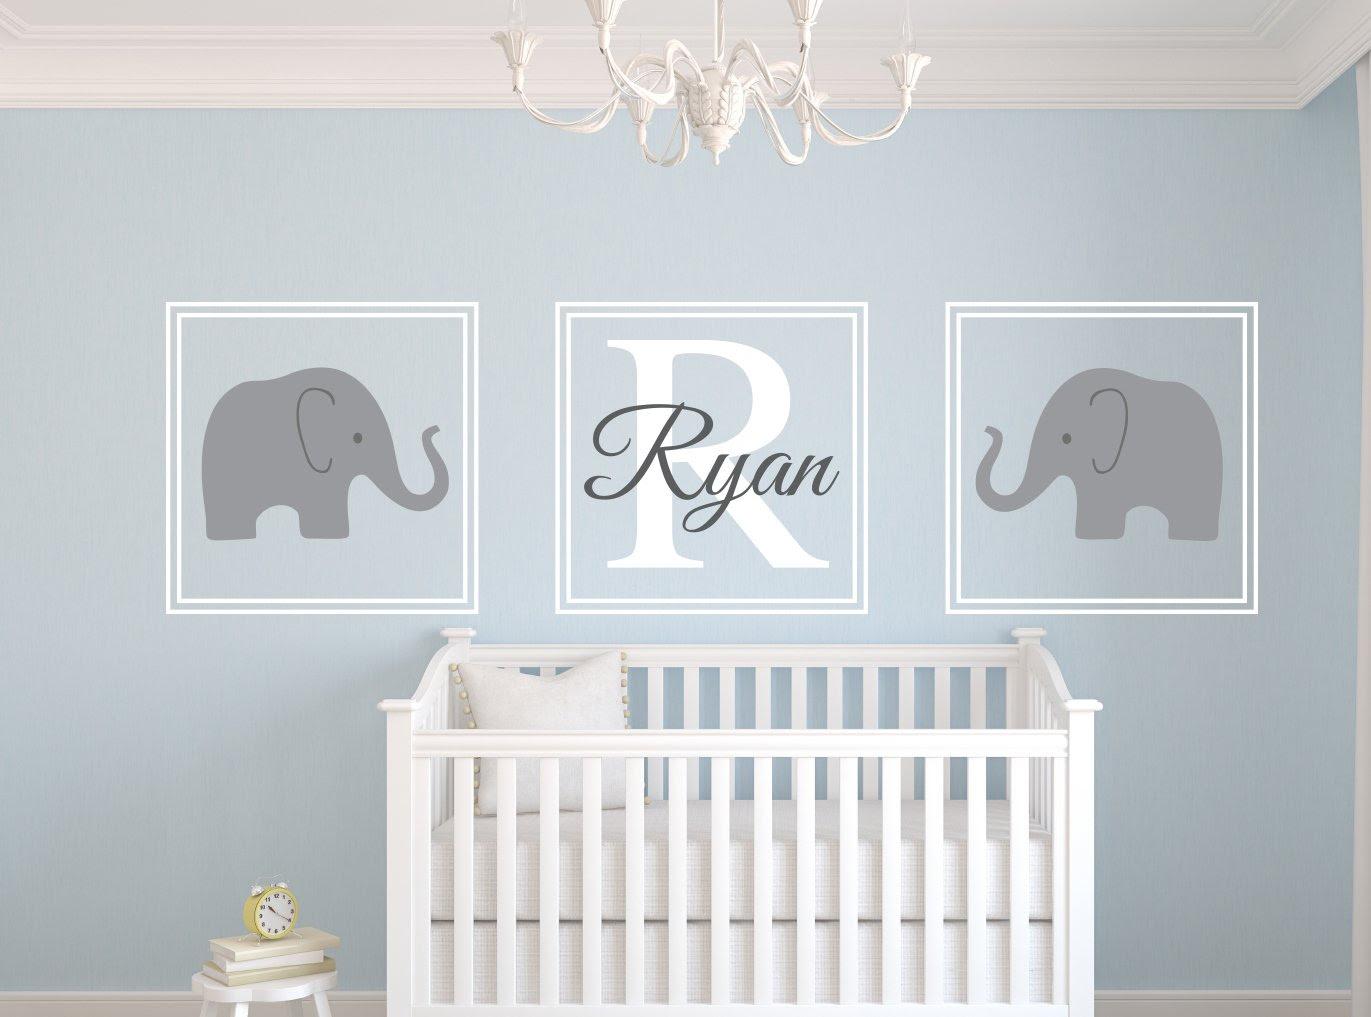 Gray Crib Bedding and Nursery Decor | WebNuggetz.com